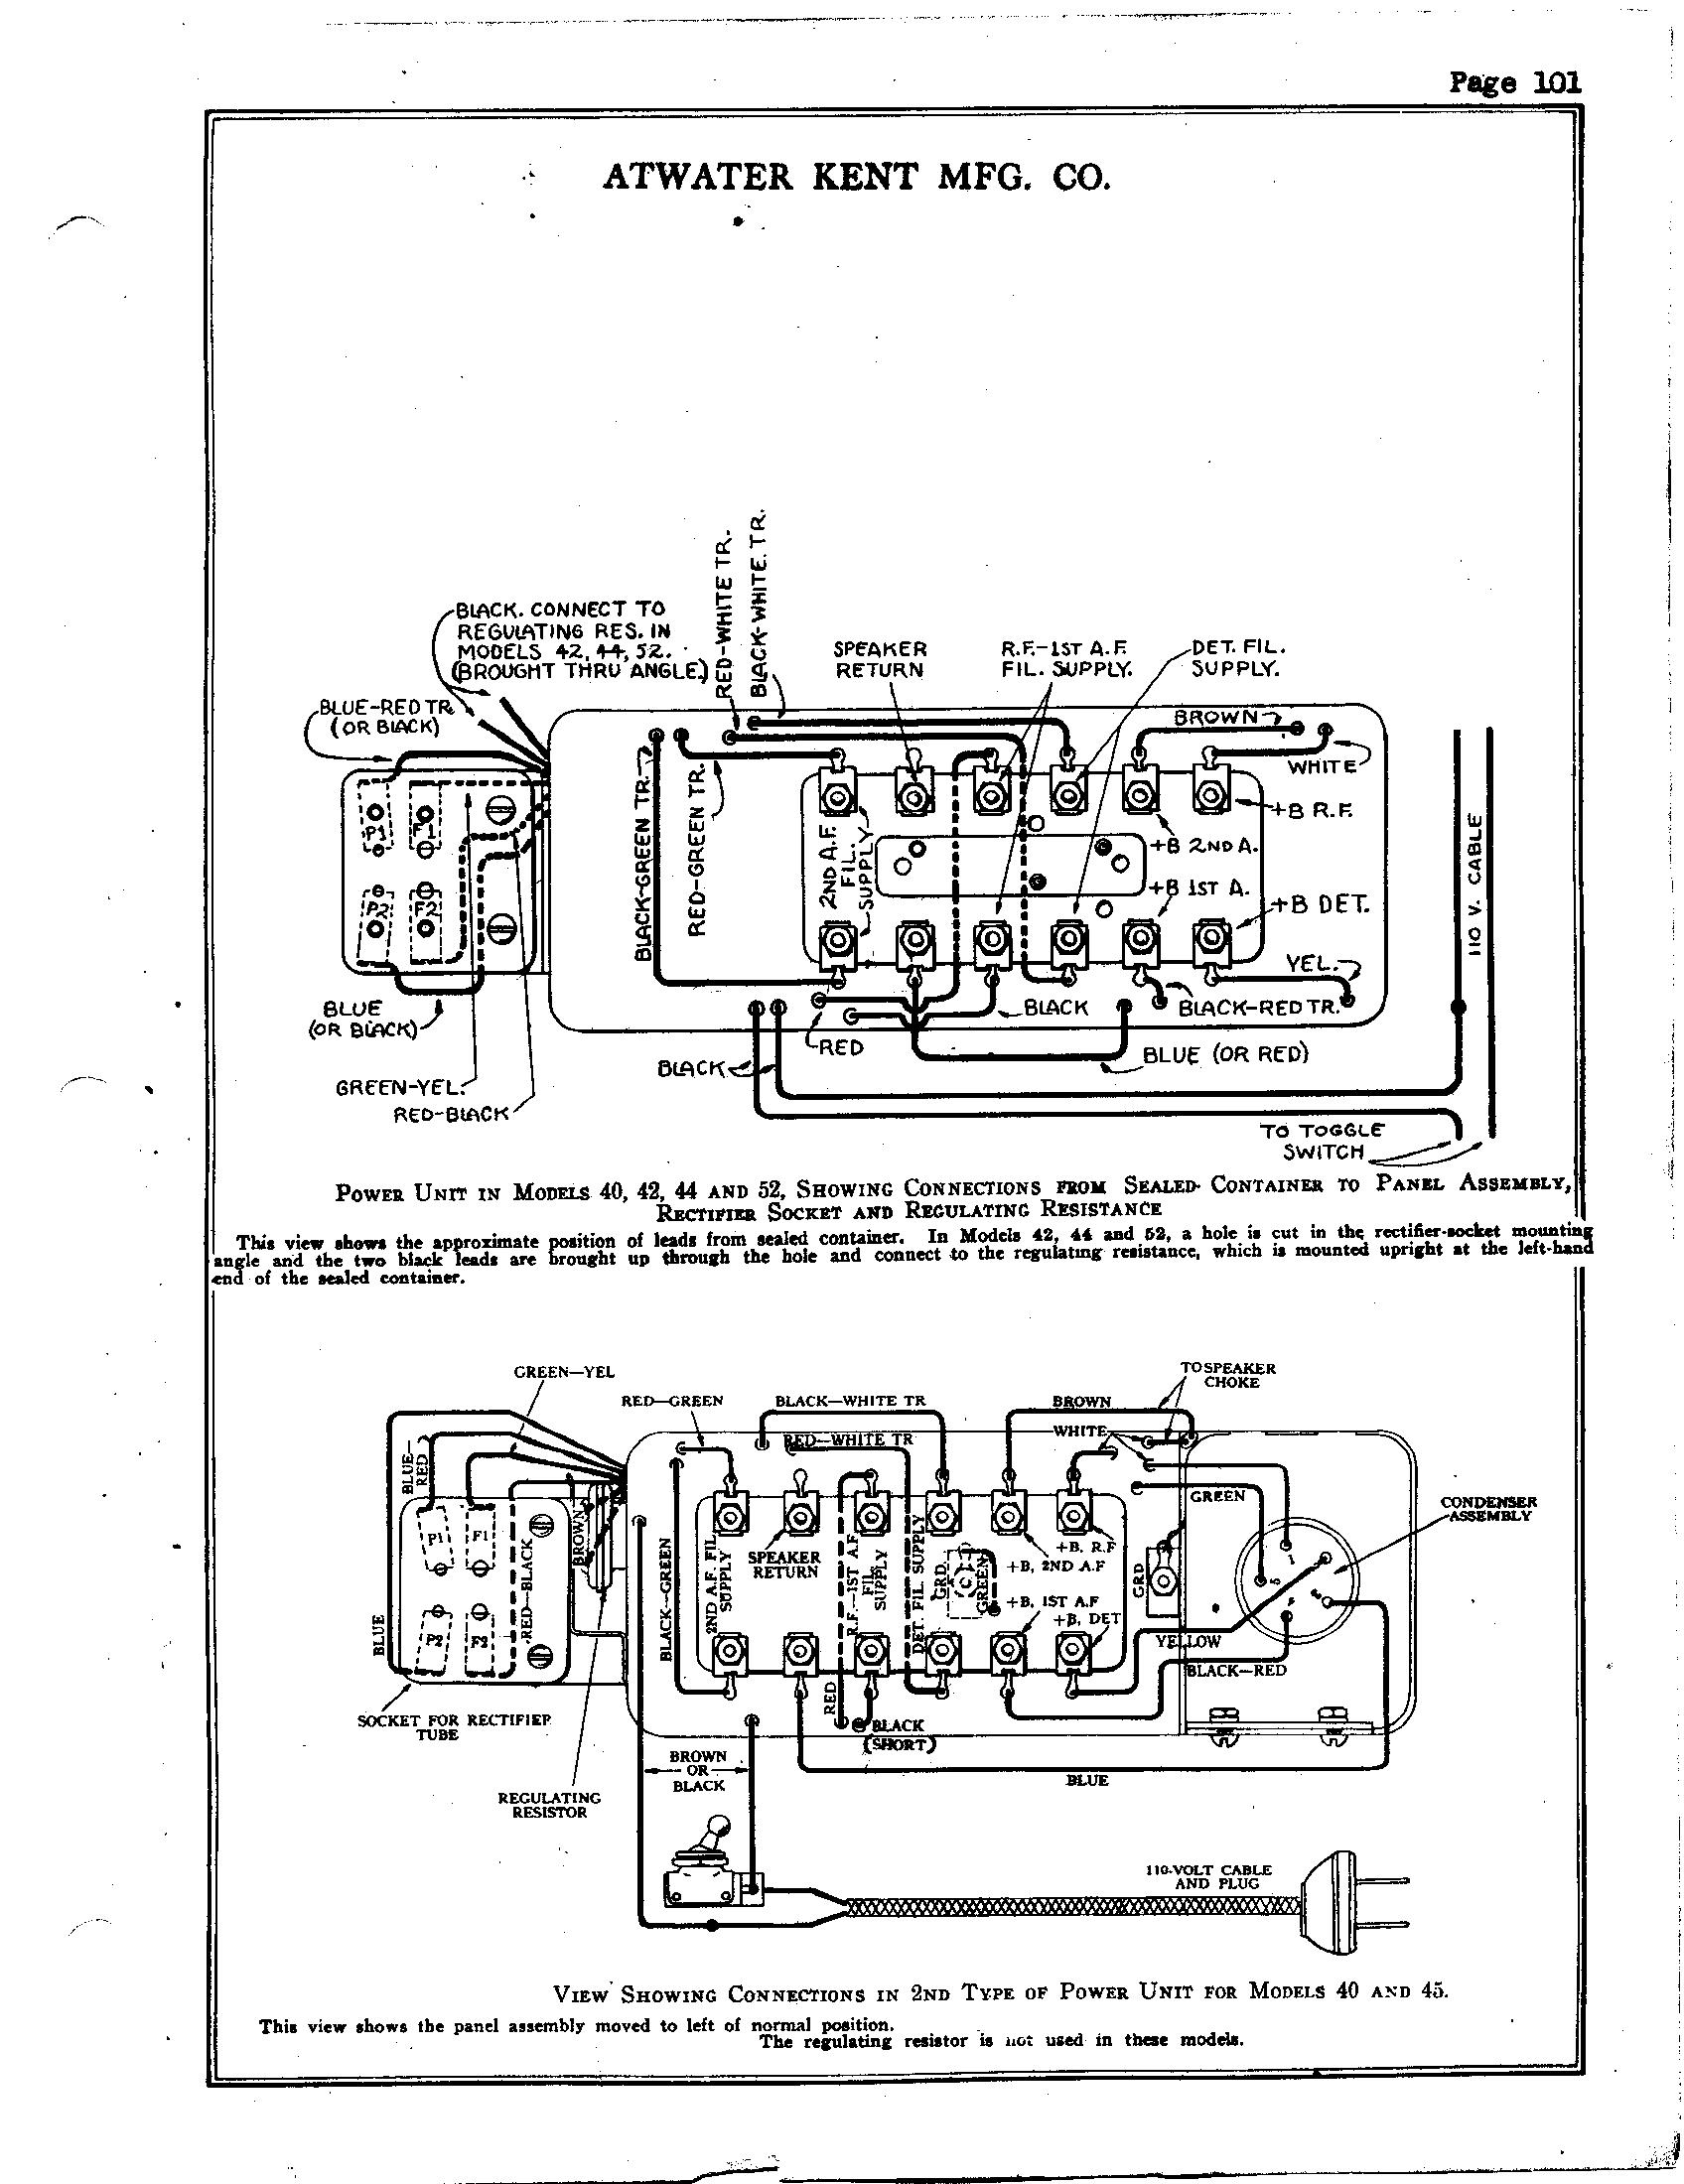 Atwater Kent 40 Power Unit